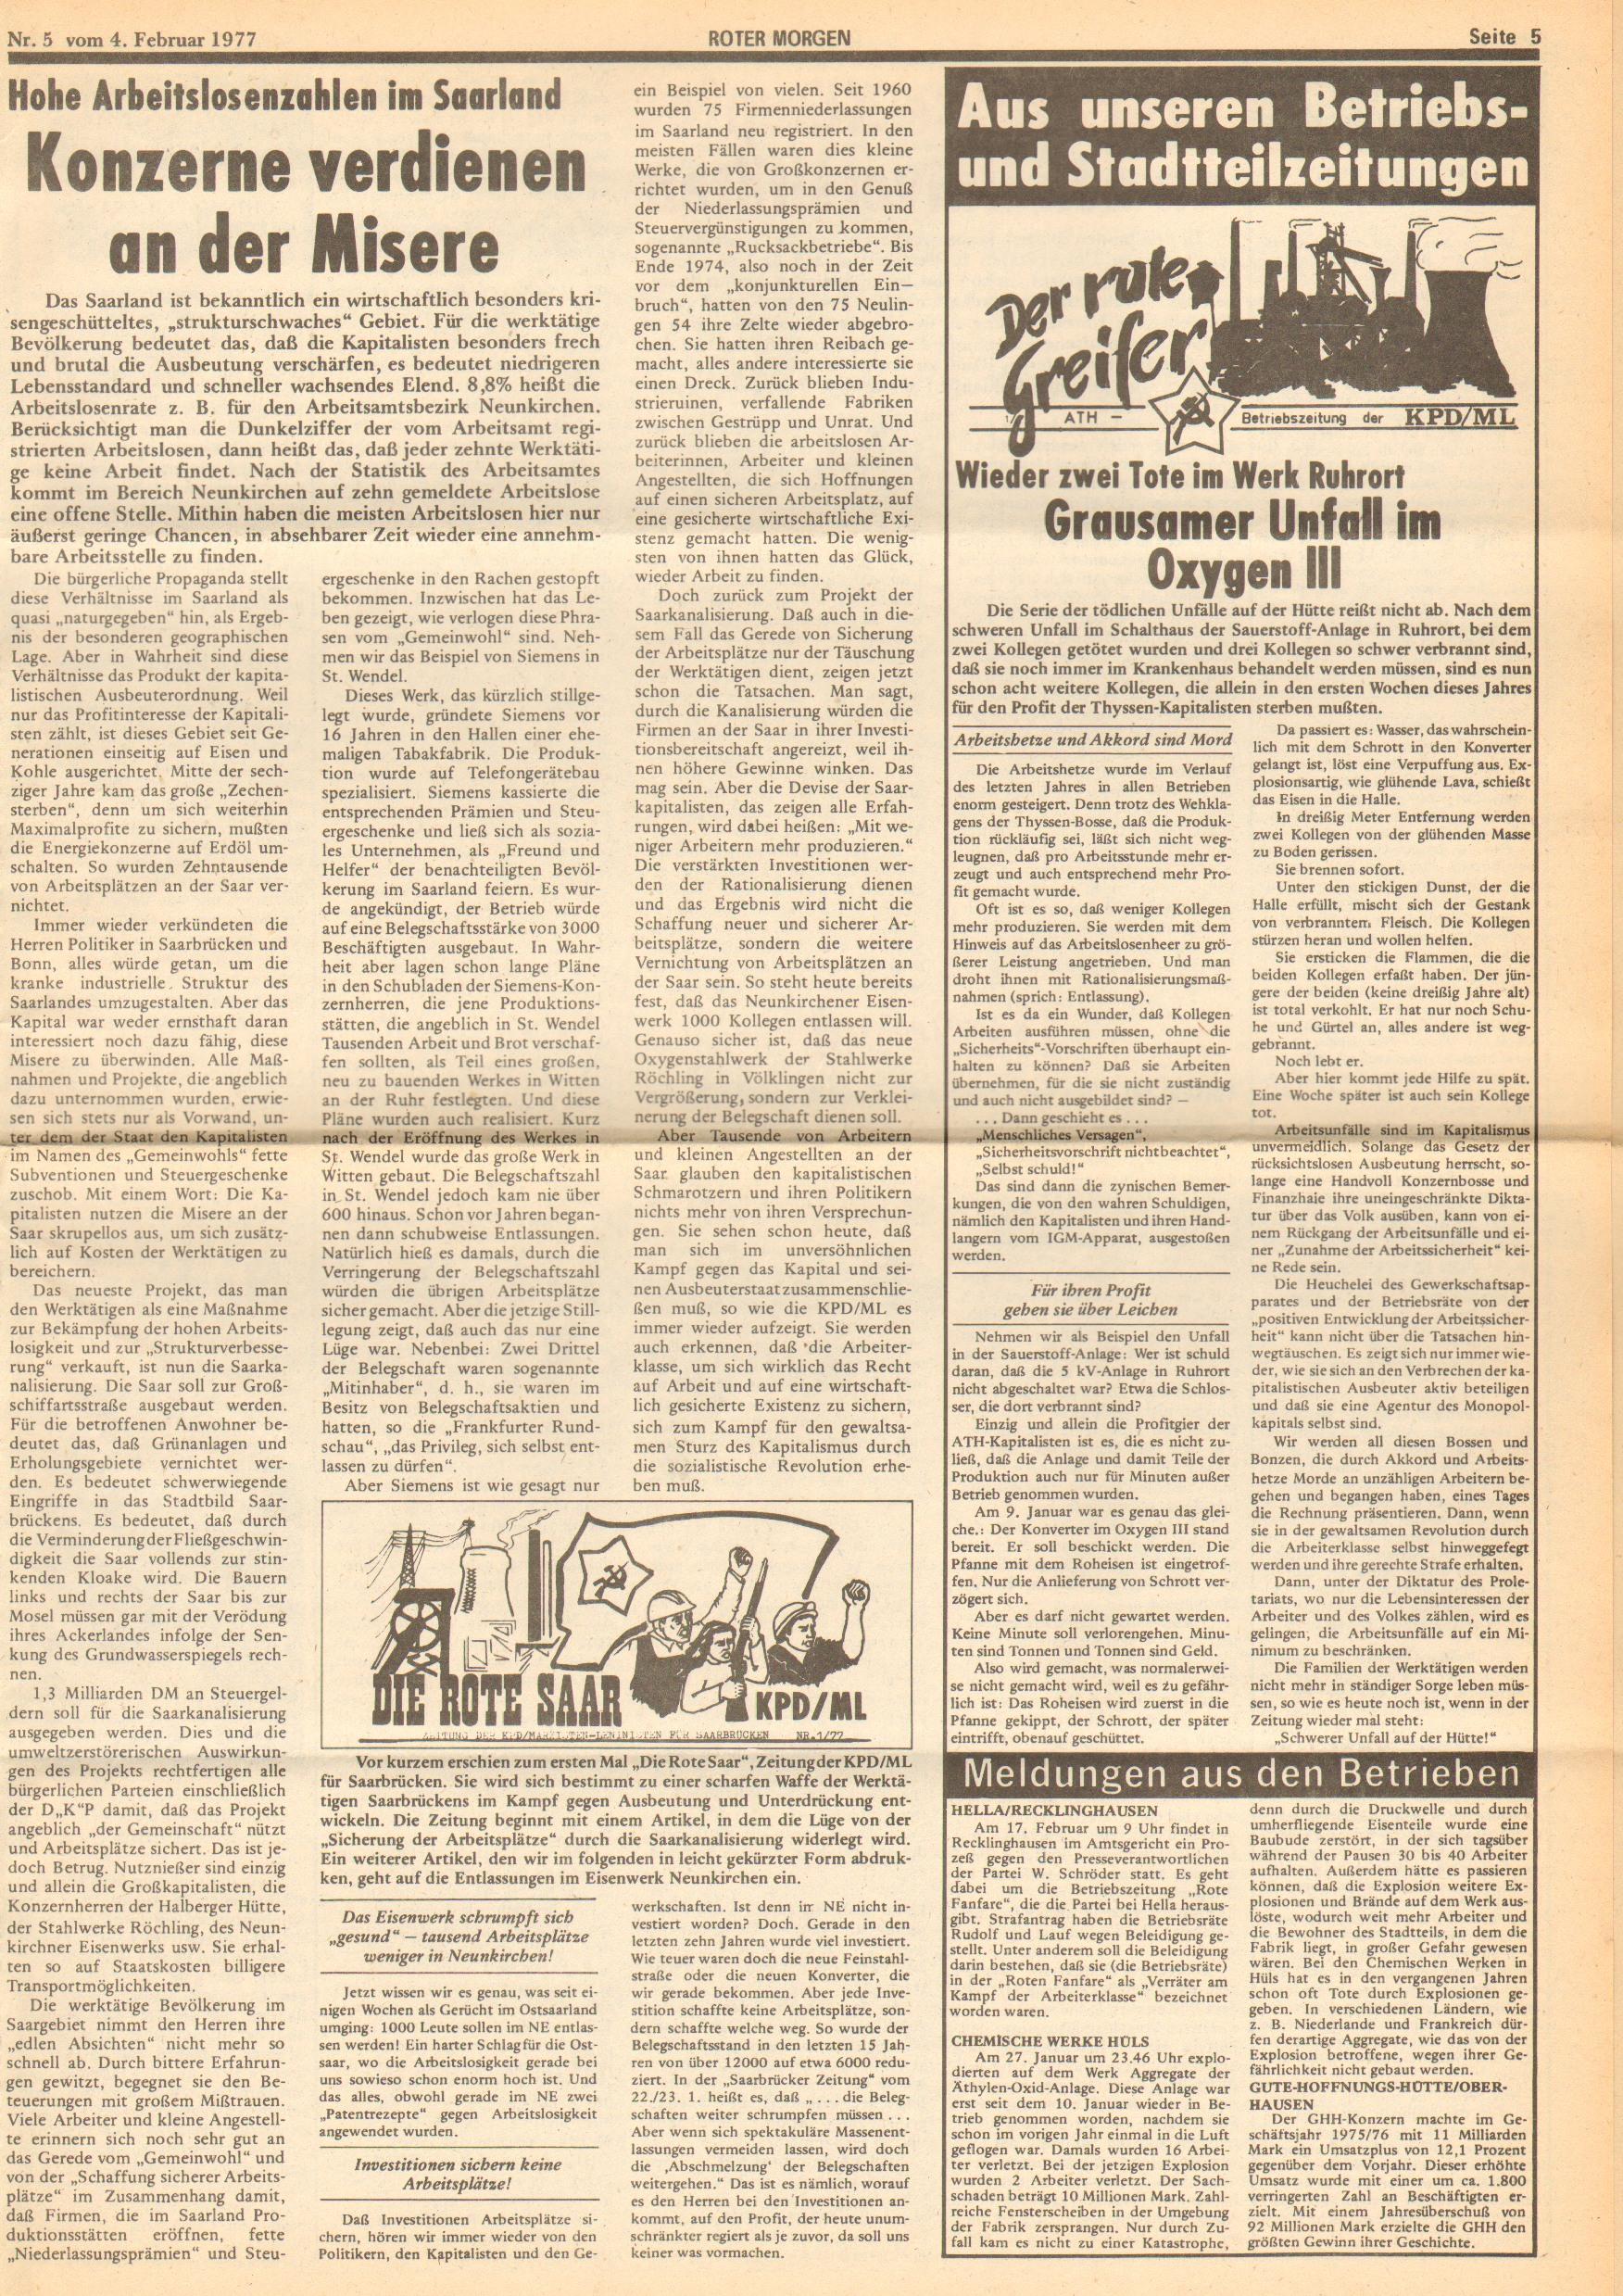 Roter Morgen, 11. Jg., 4. Februar 1977, Nr. 5, Seite 5